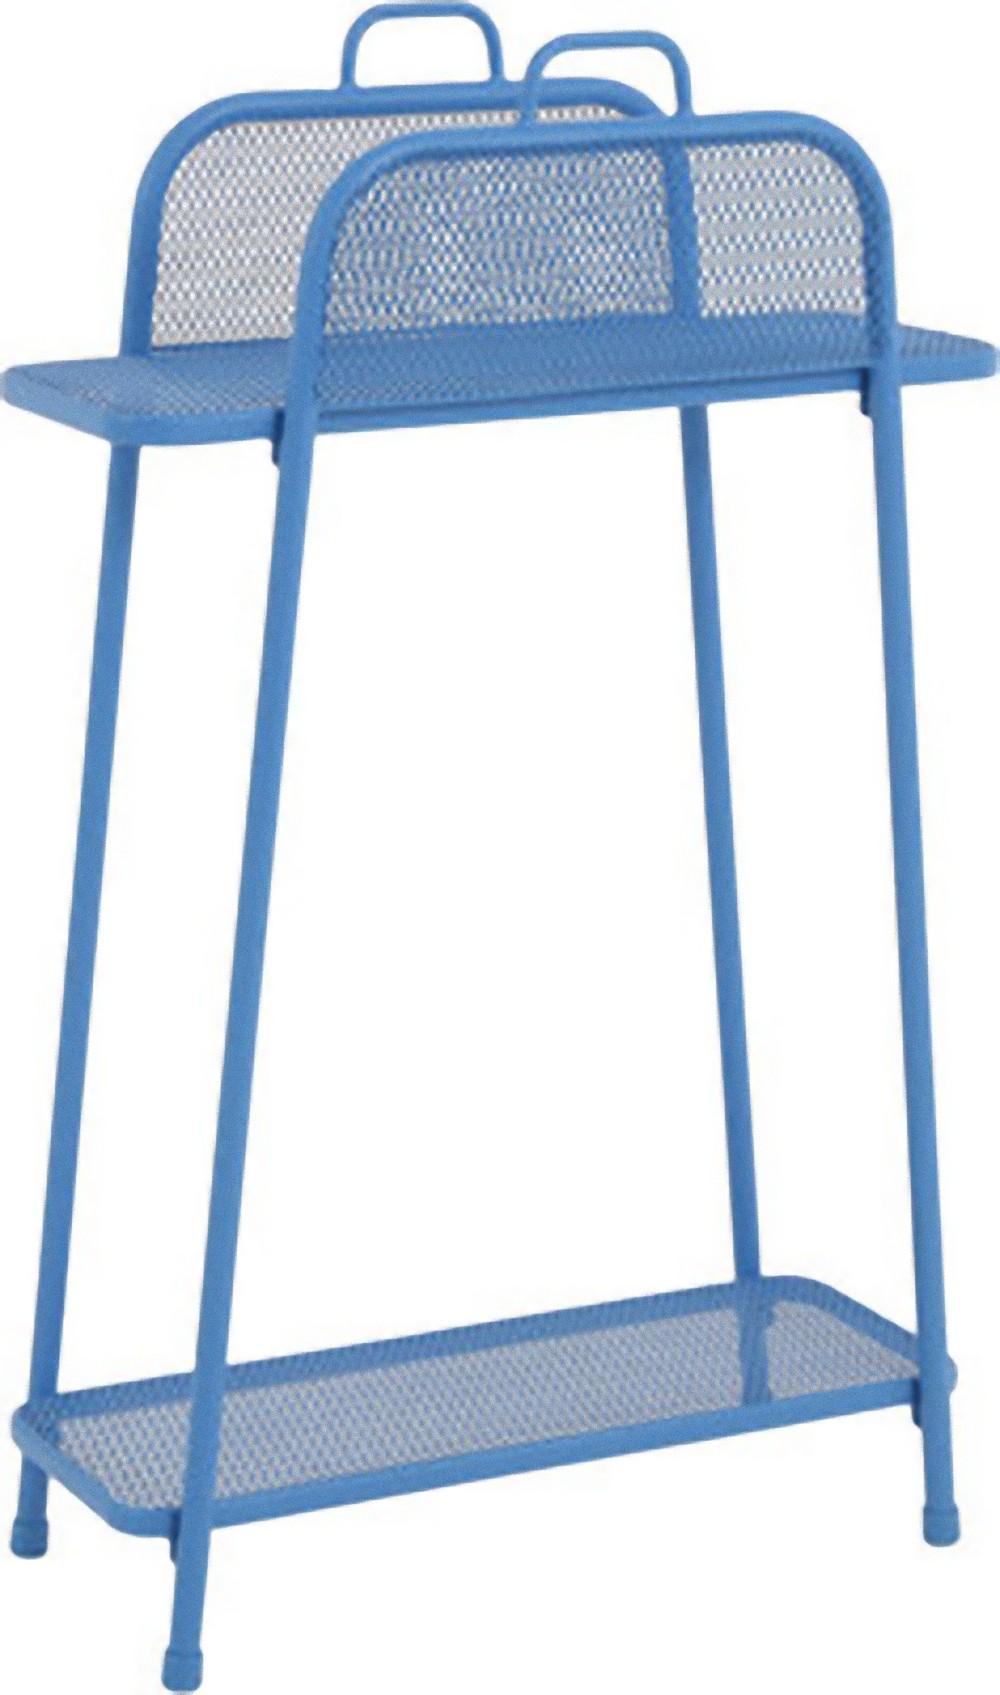 metall balkonregal blau balkon garten terrasse regal standregal m bel tisch ebay. Black Bedroom Furniture Sets. Home Design Ideas